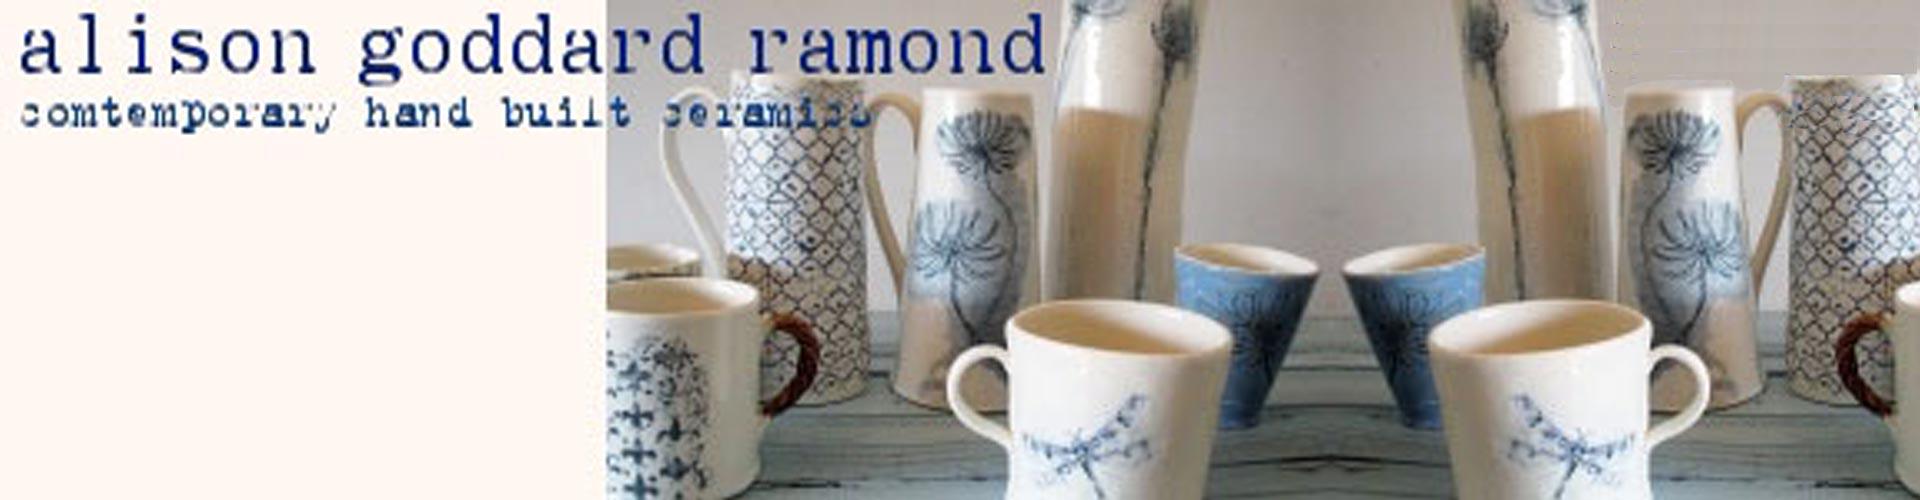 Alison Goddard Ramond, céramique à Soubès, Hérault